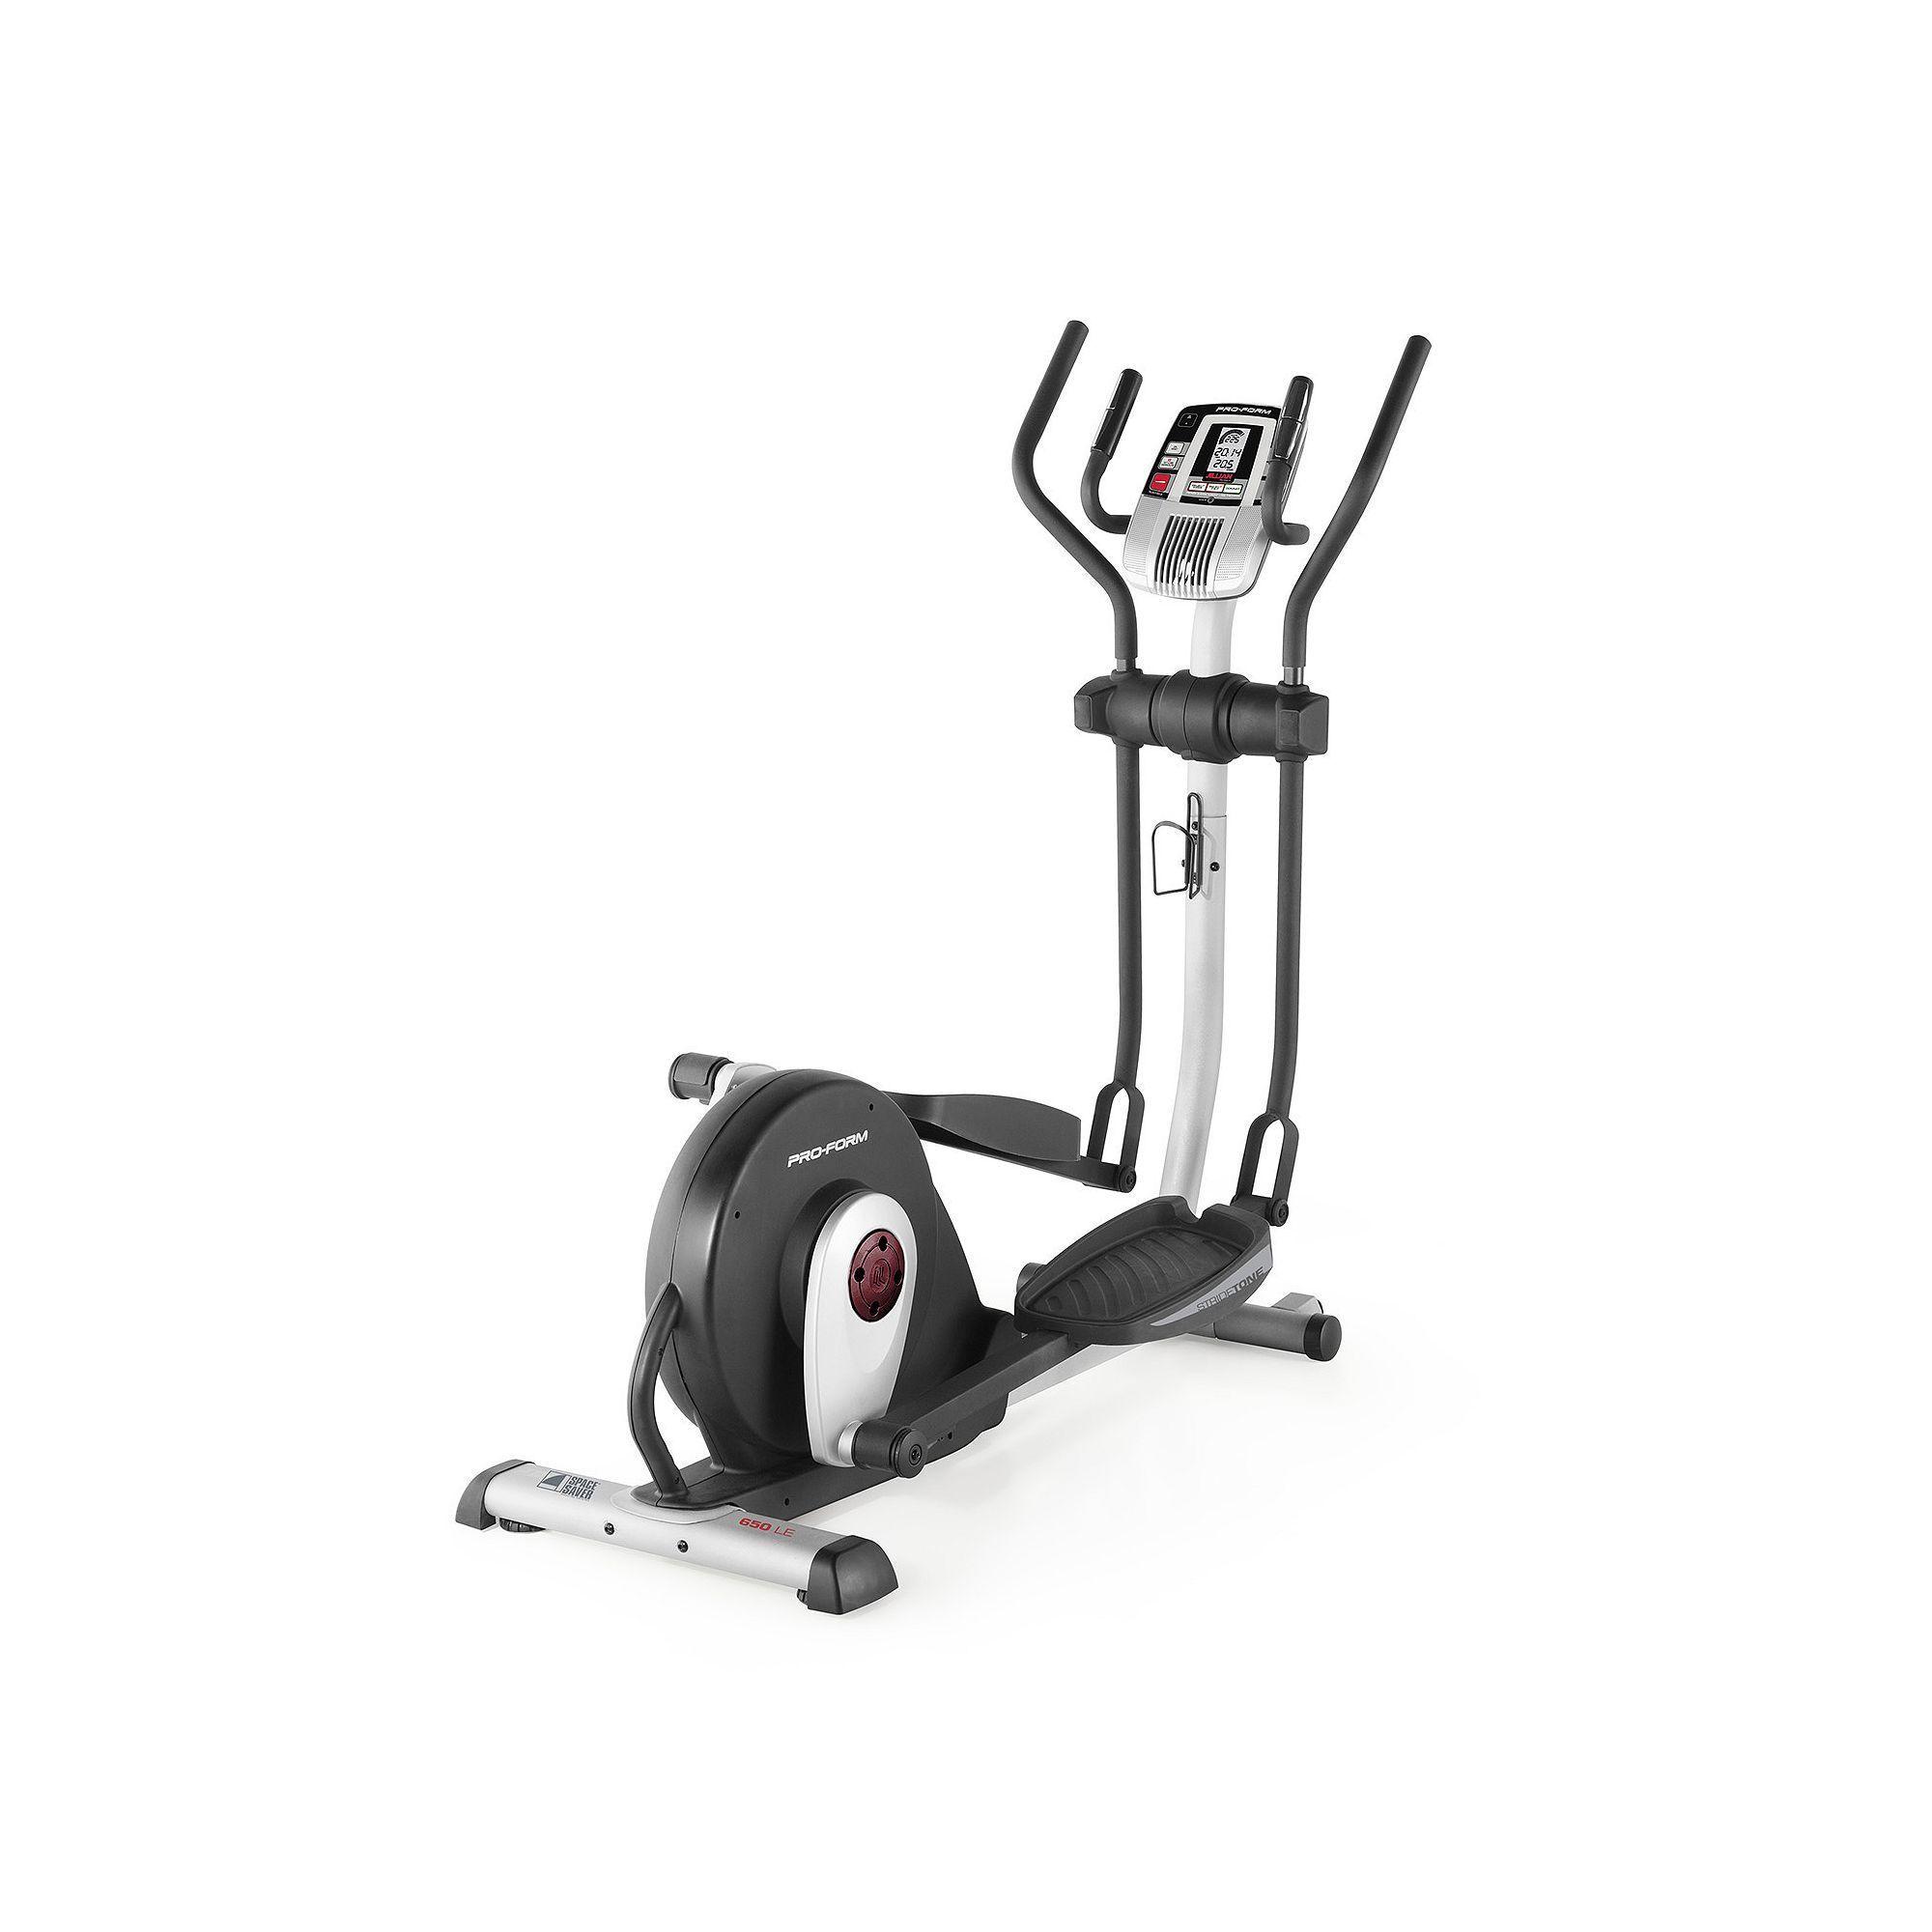 Elliptical Trainer, Fitness